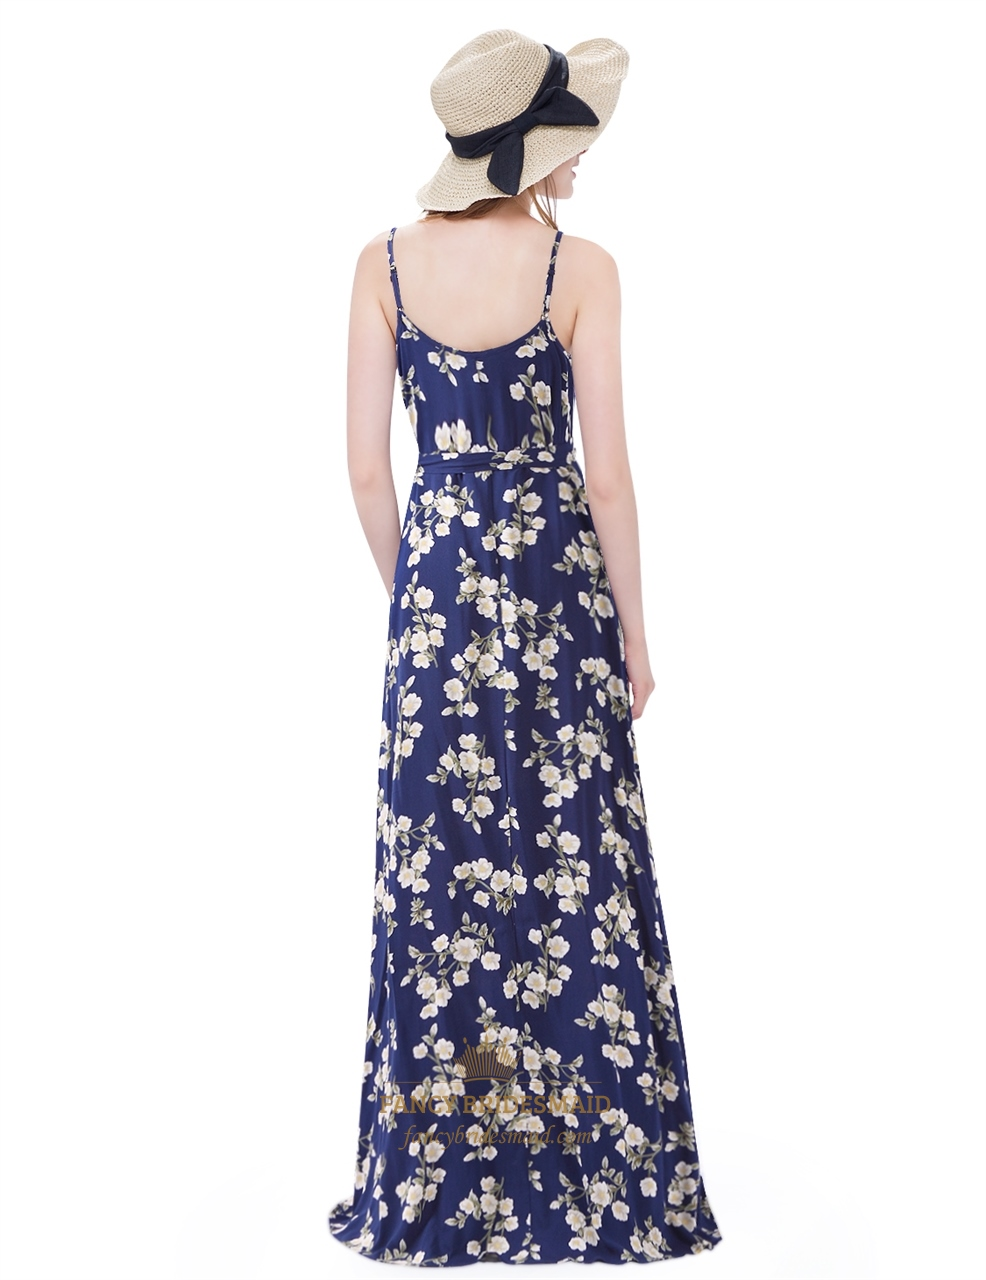 ecd4989083 Women s Floral Print Full Length Maxi Dress With Spaghetti Straps ...